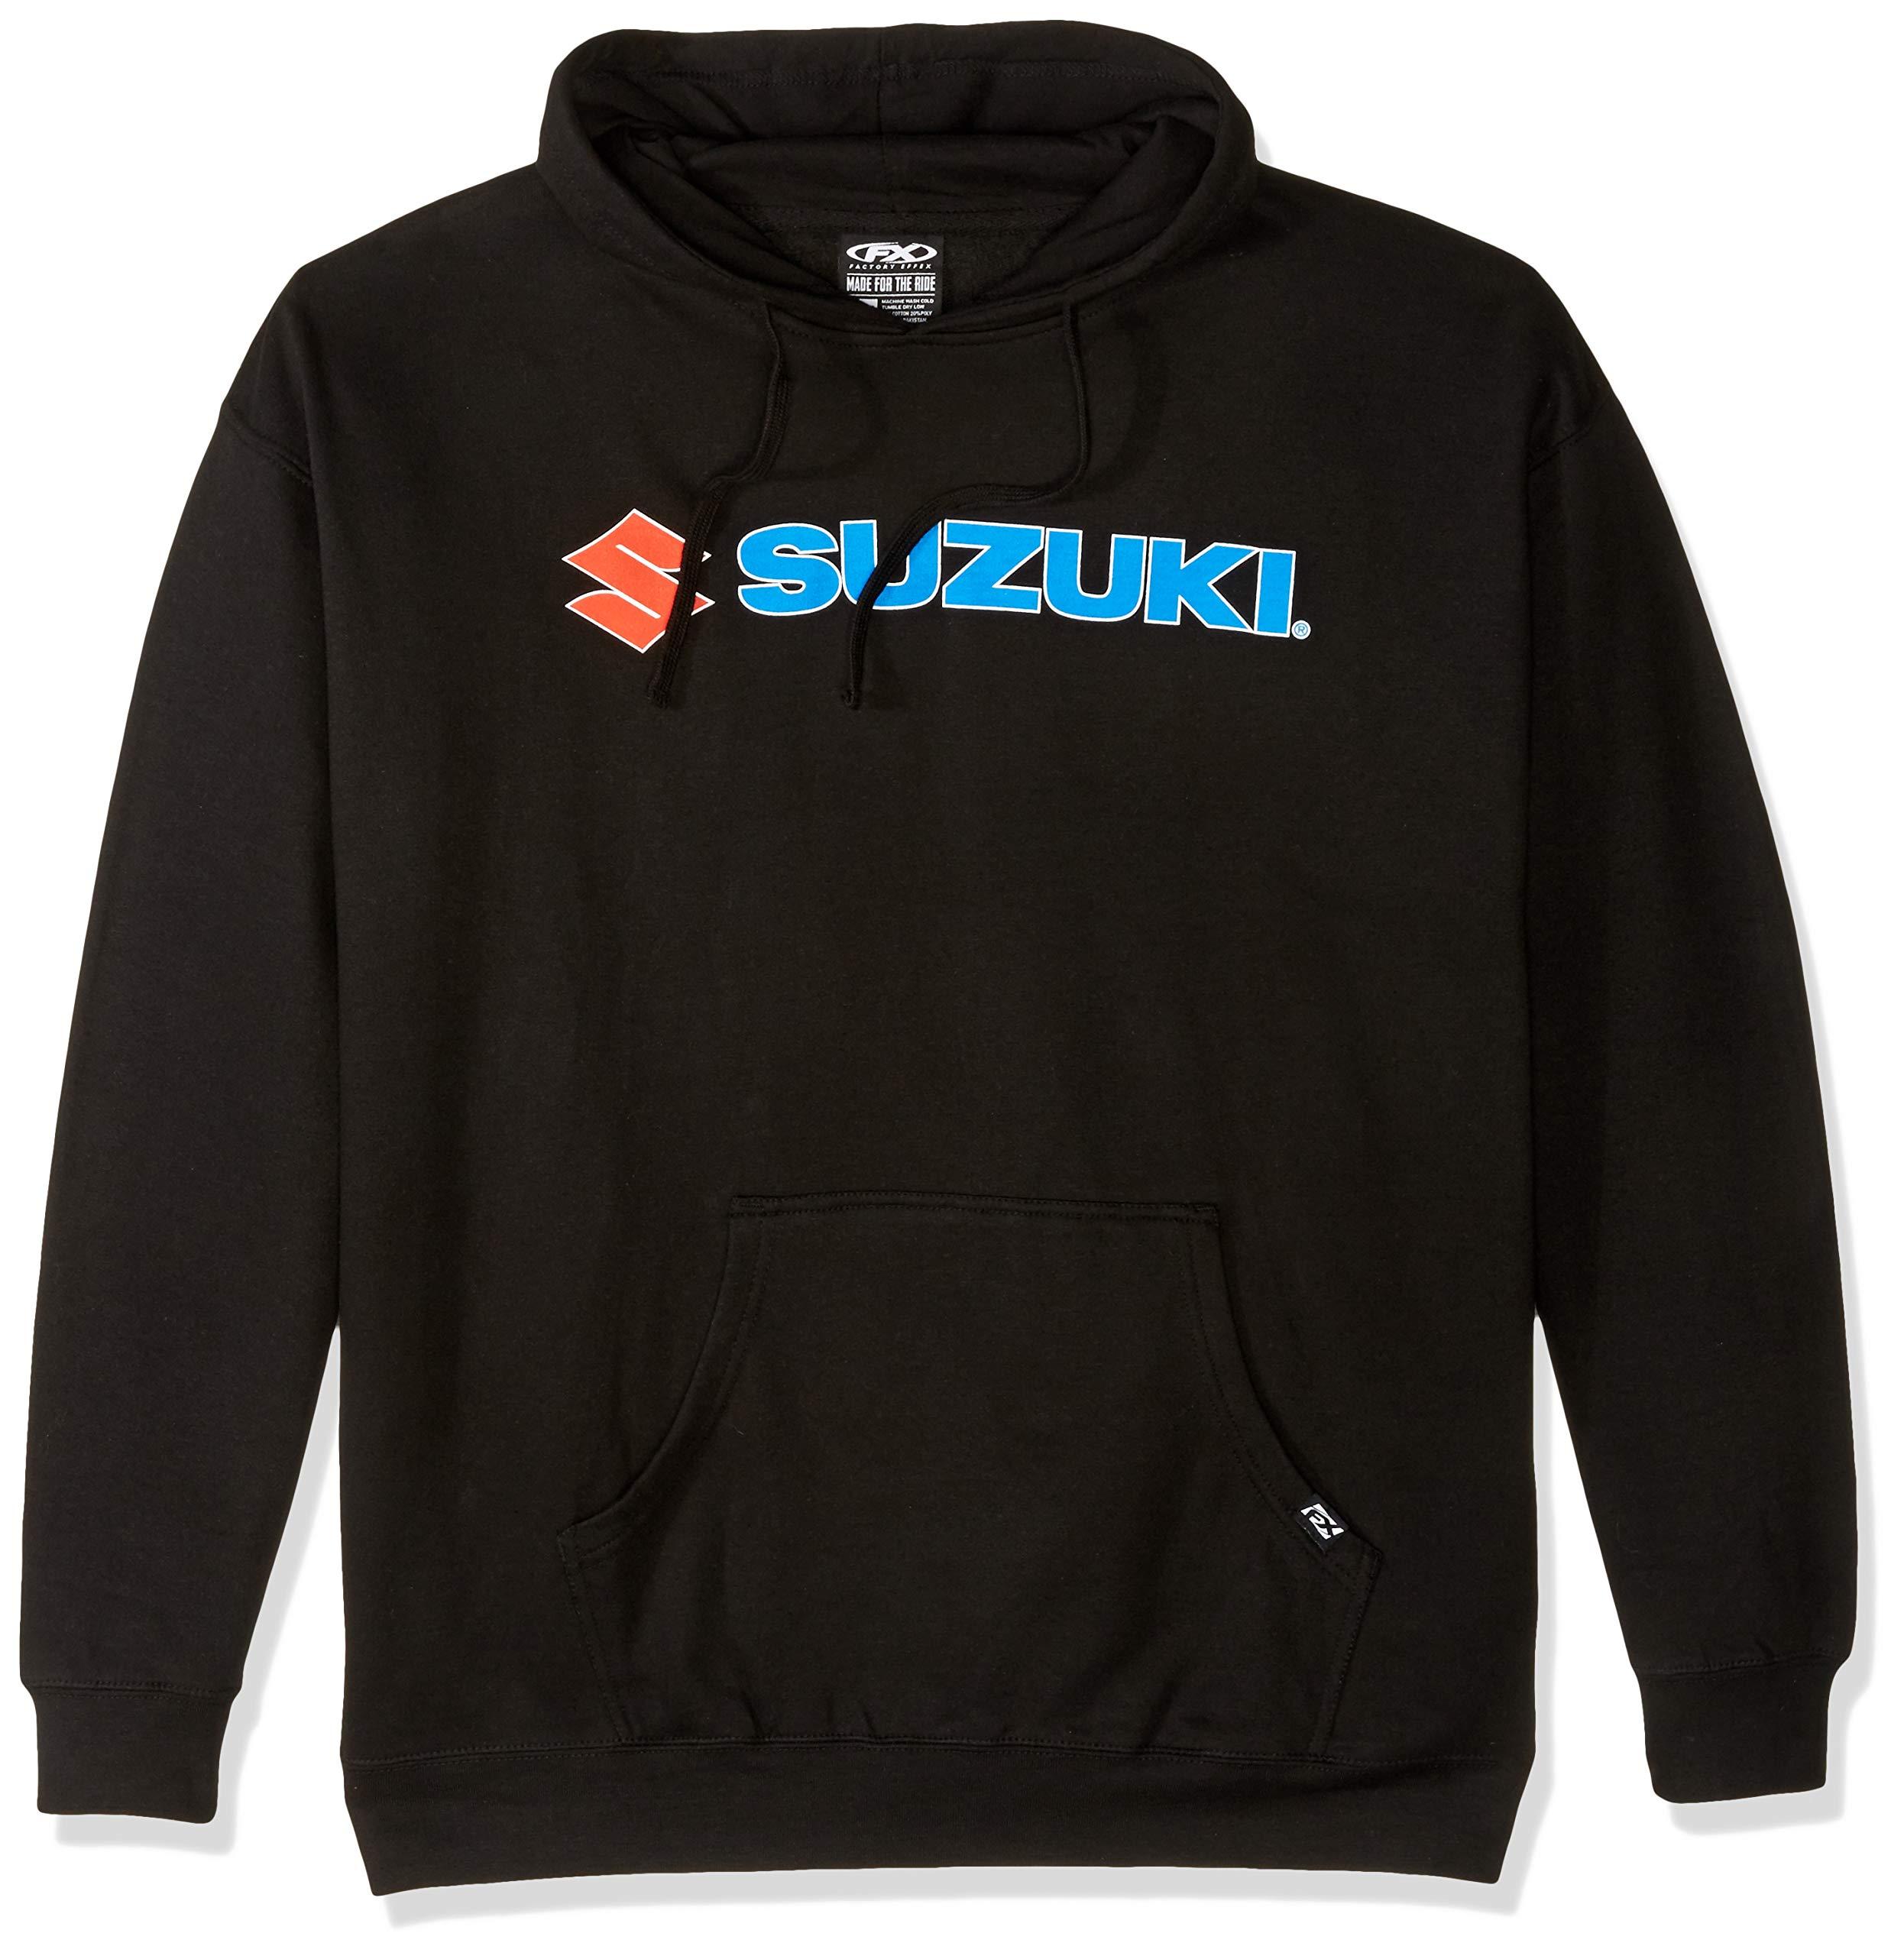 Factory Effex 15-88406 'Suzuki' Hooded Pull-over Sweatshirt (Black, XX-Large)